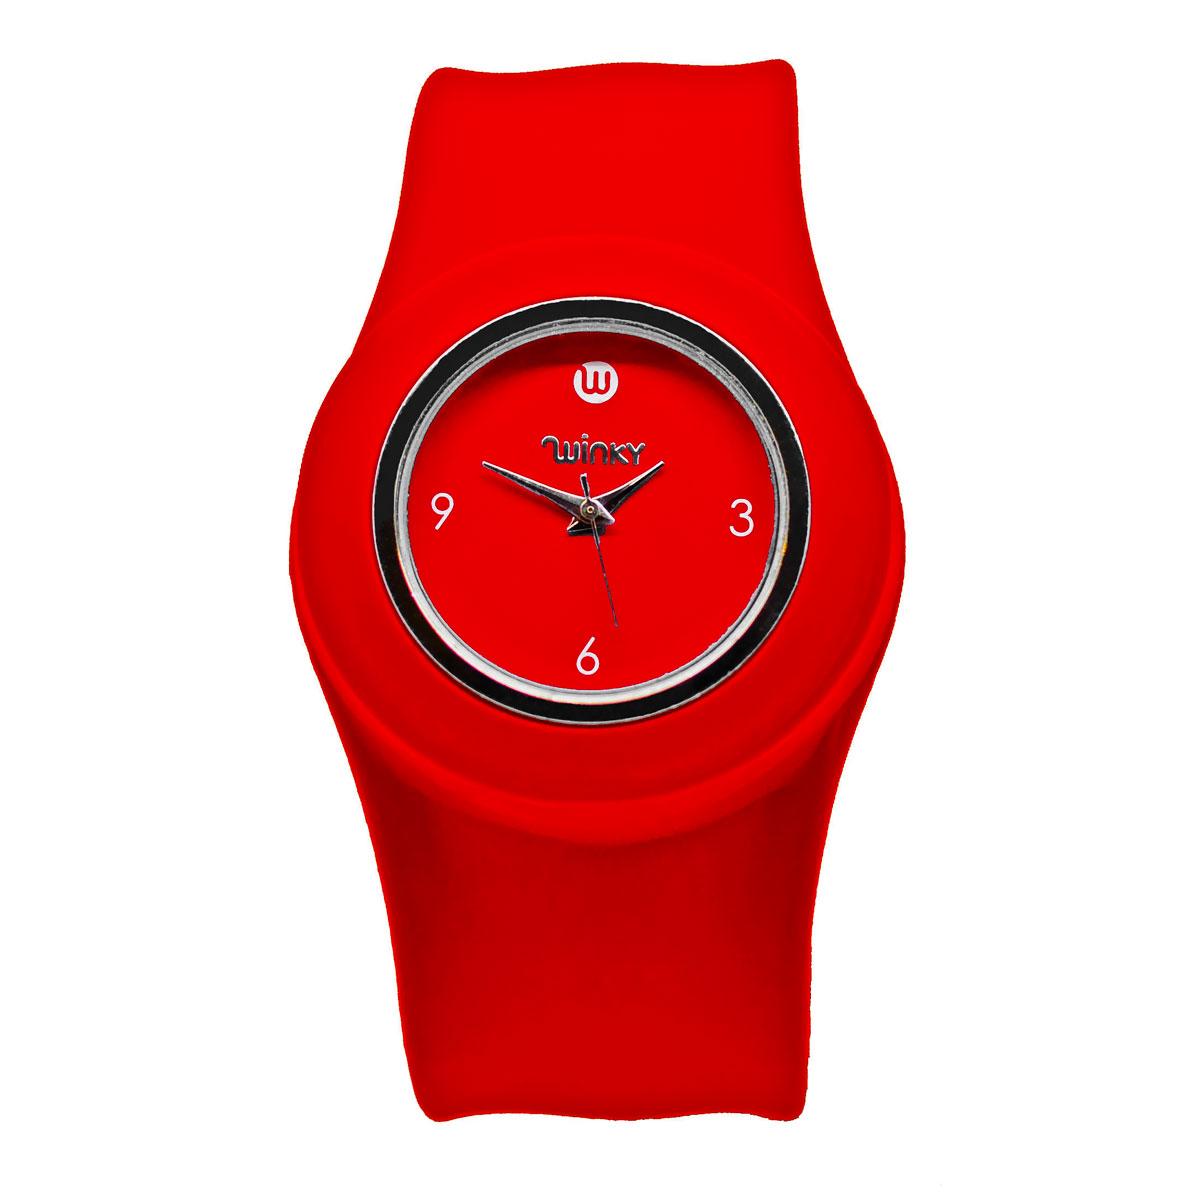 WD-SB-1004-Apple-Red-Slap-watch